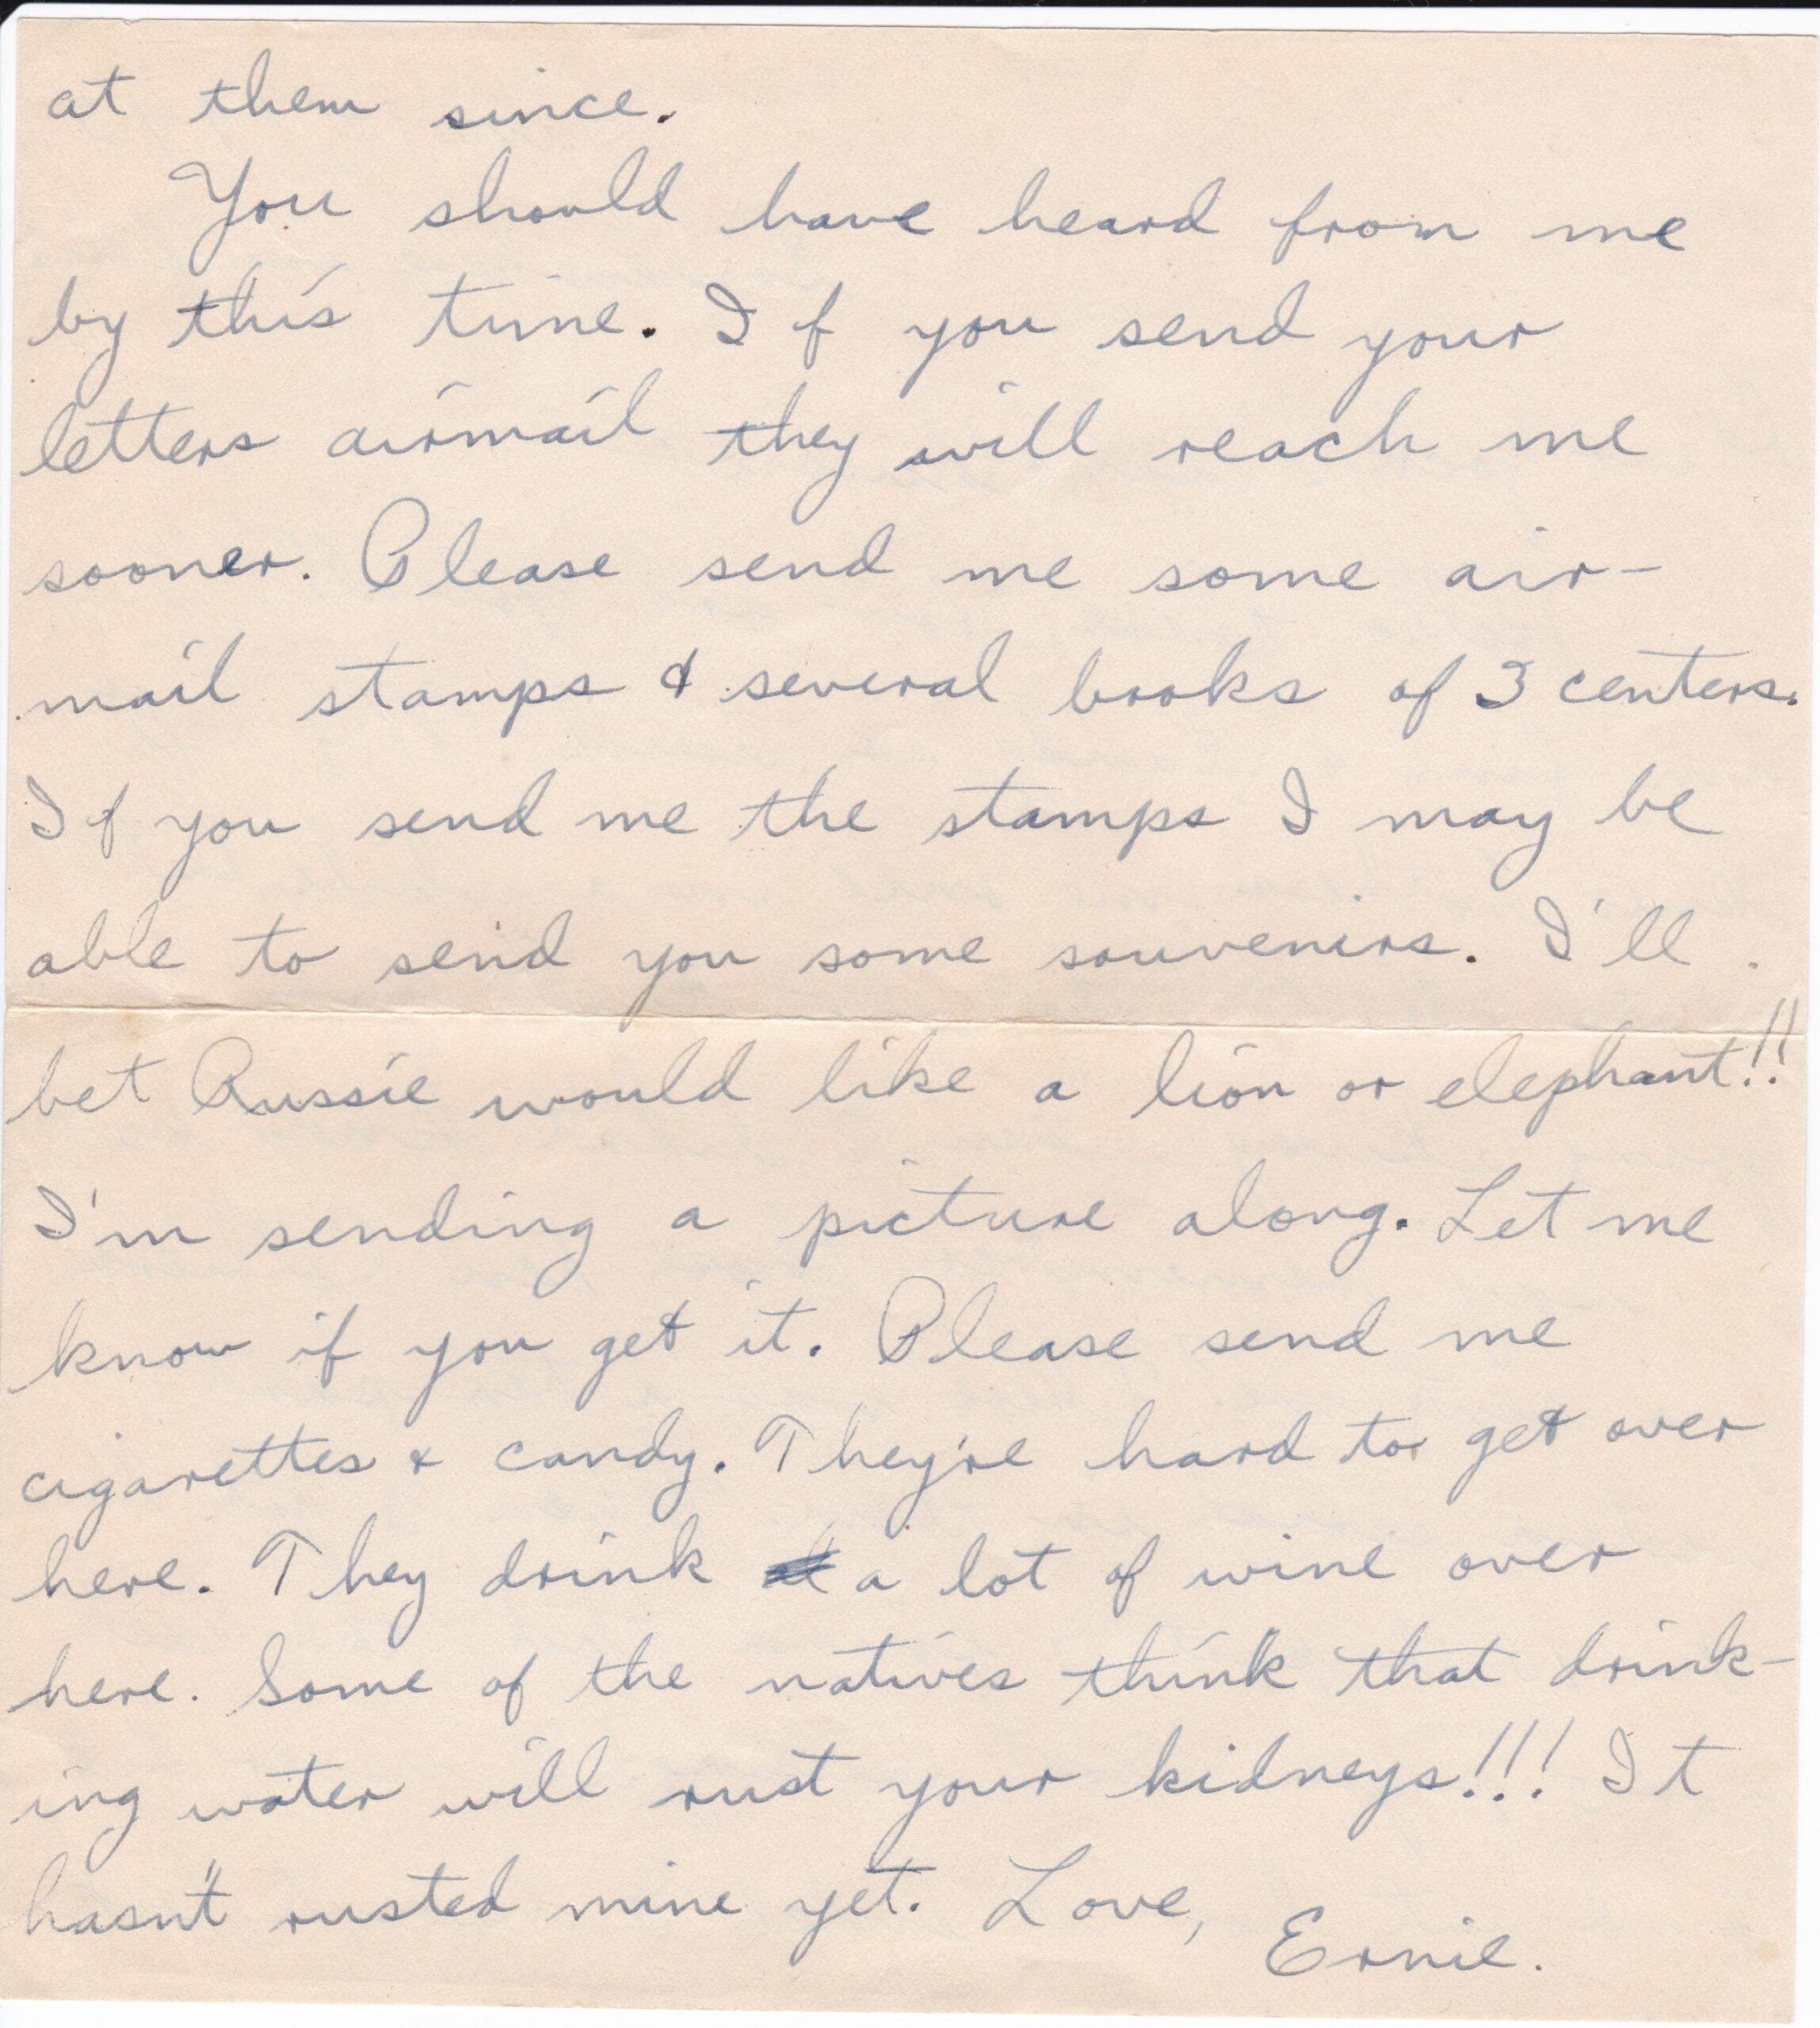 PFC William E Struble 01-14-1943